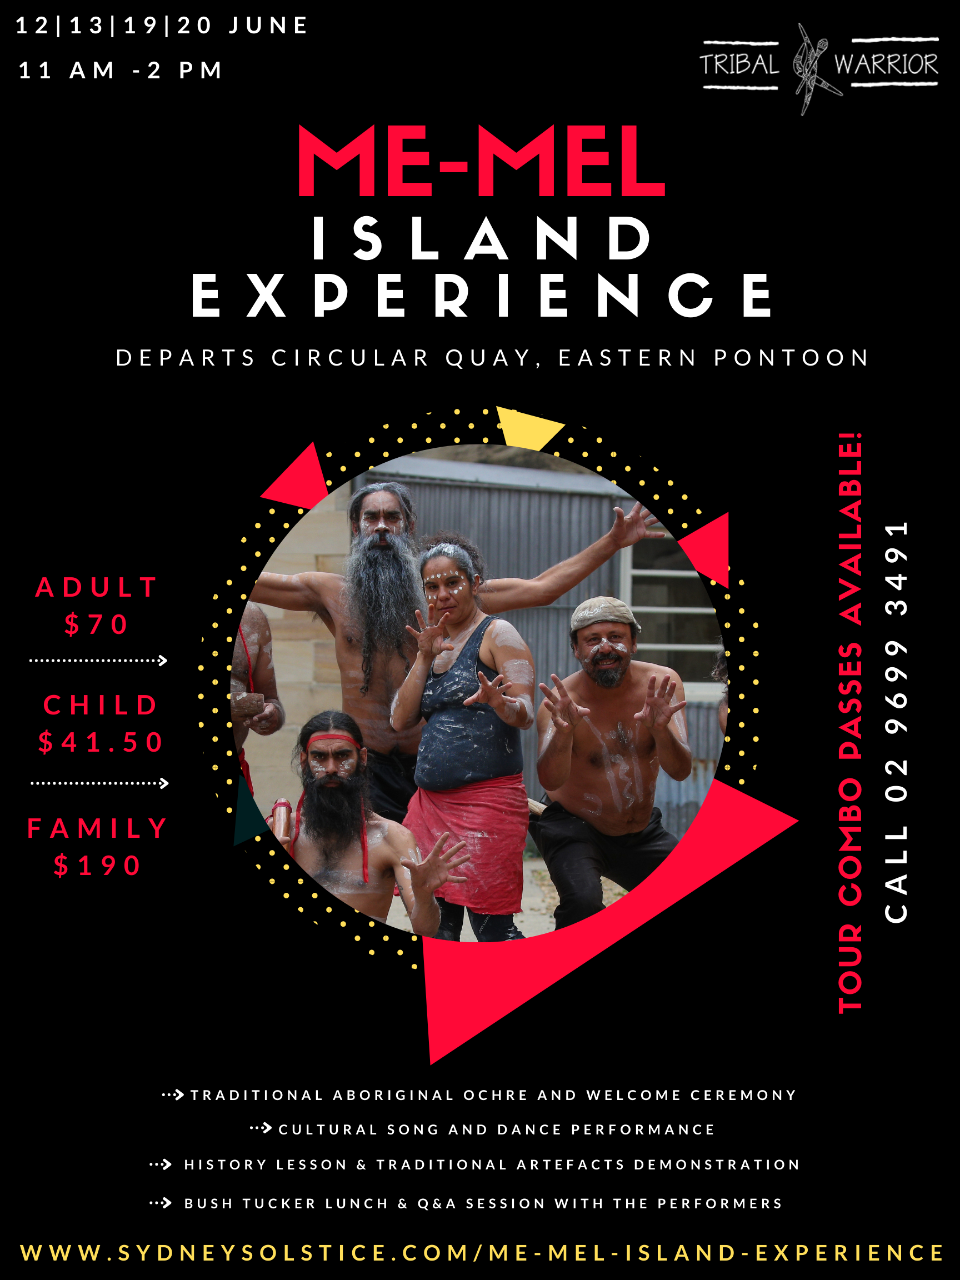 Me-Mel Island Experience